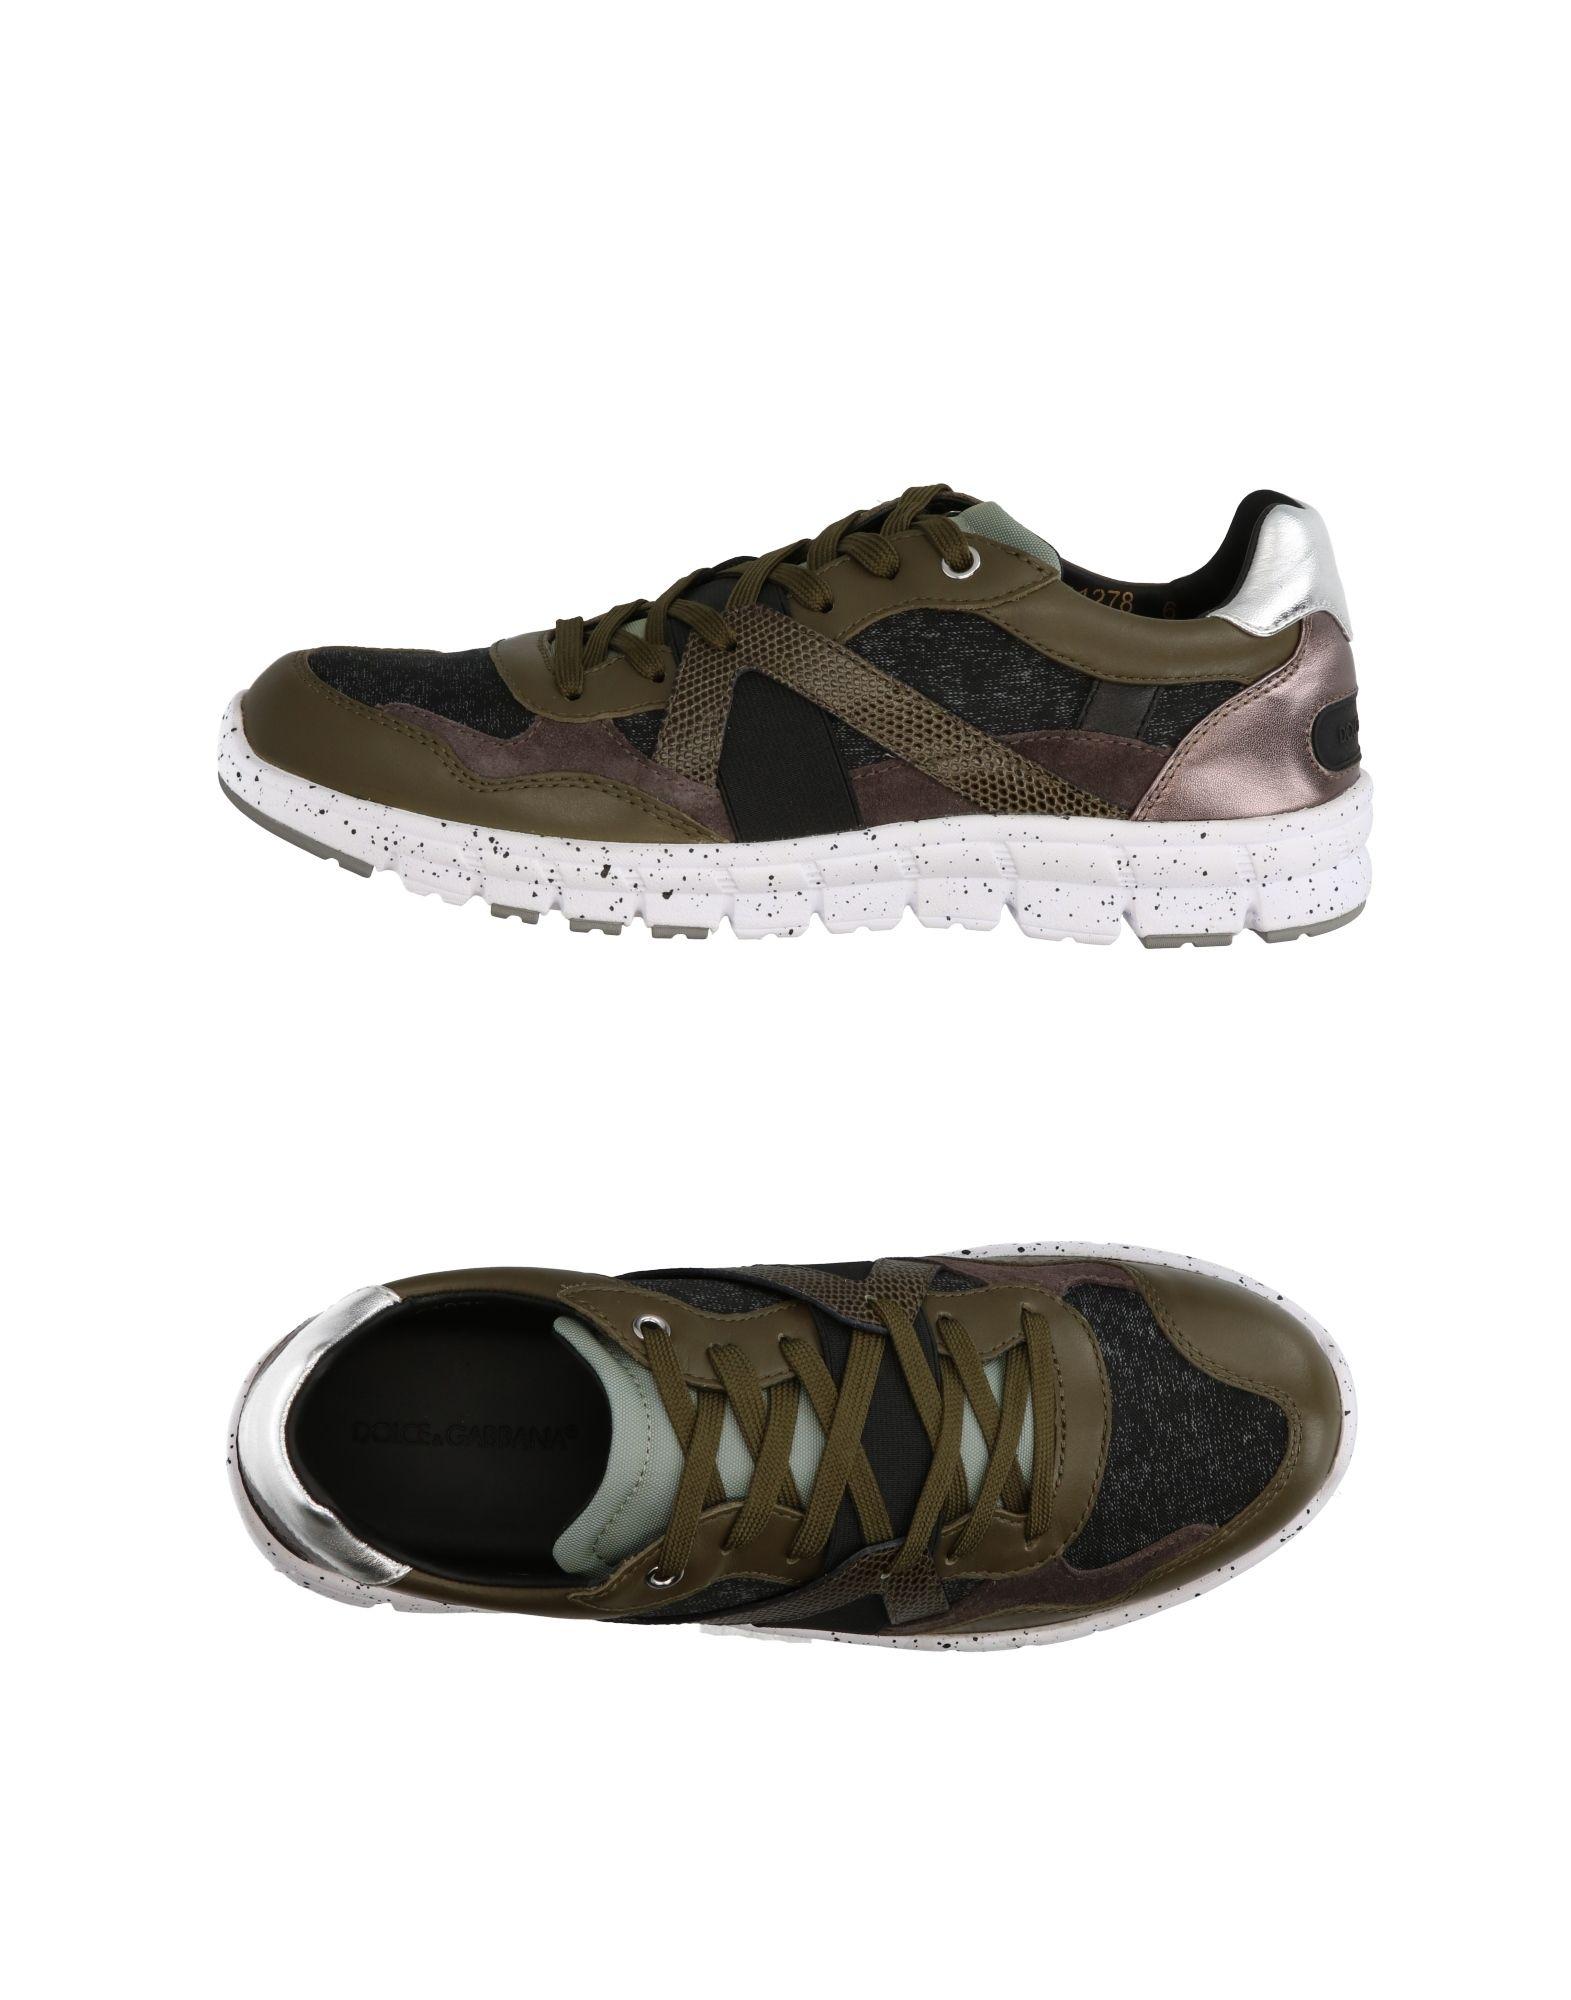 Dolce & Gabbana Sneakers Herren  Schuhe 11270719AE Gute Qualität beliebte Schuhe  110bdb